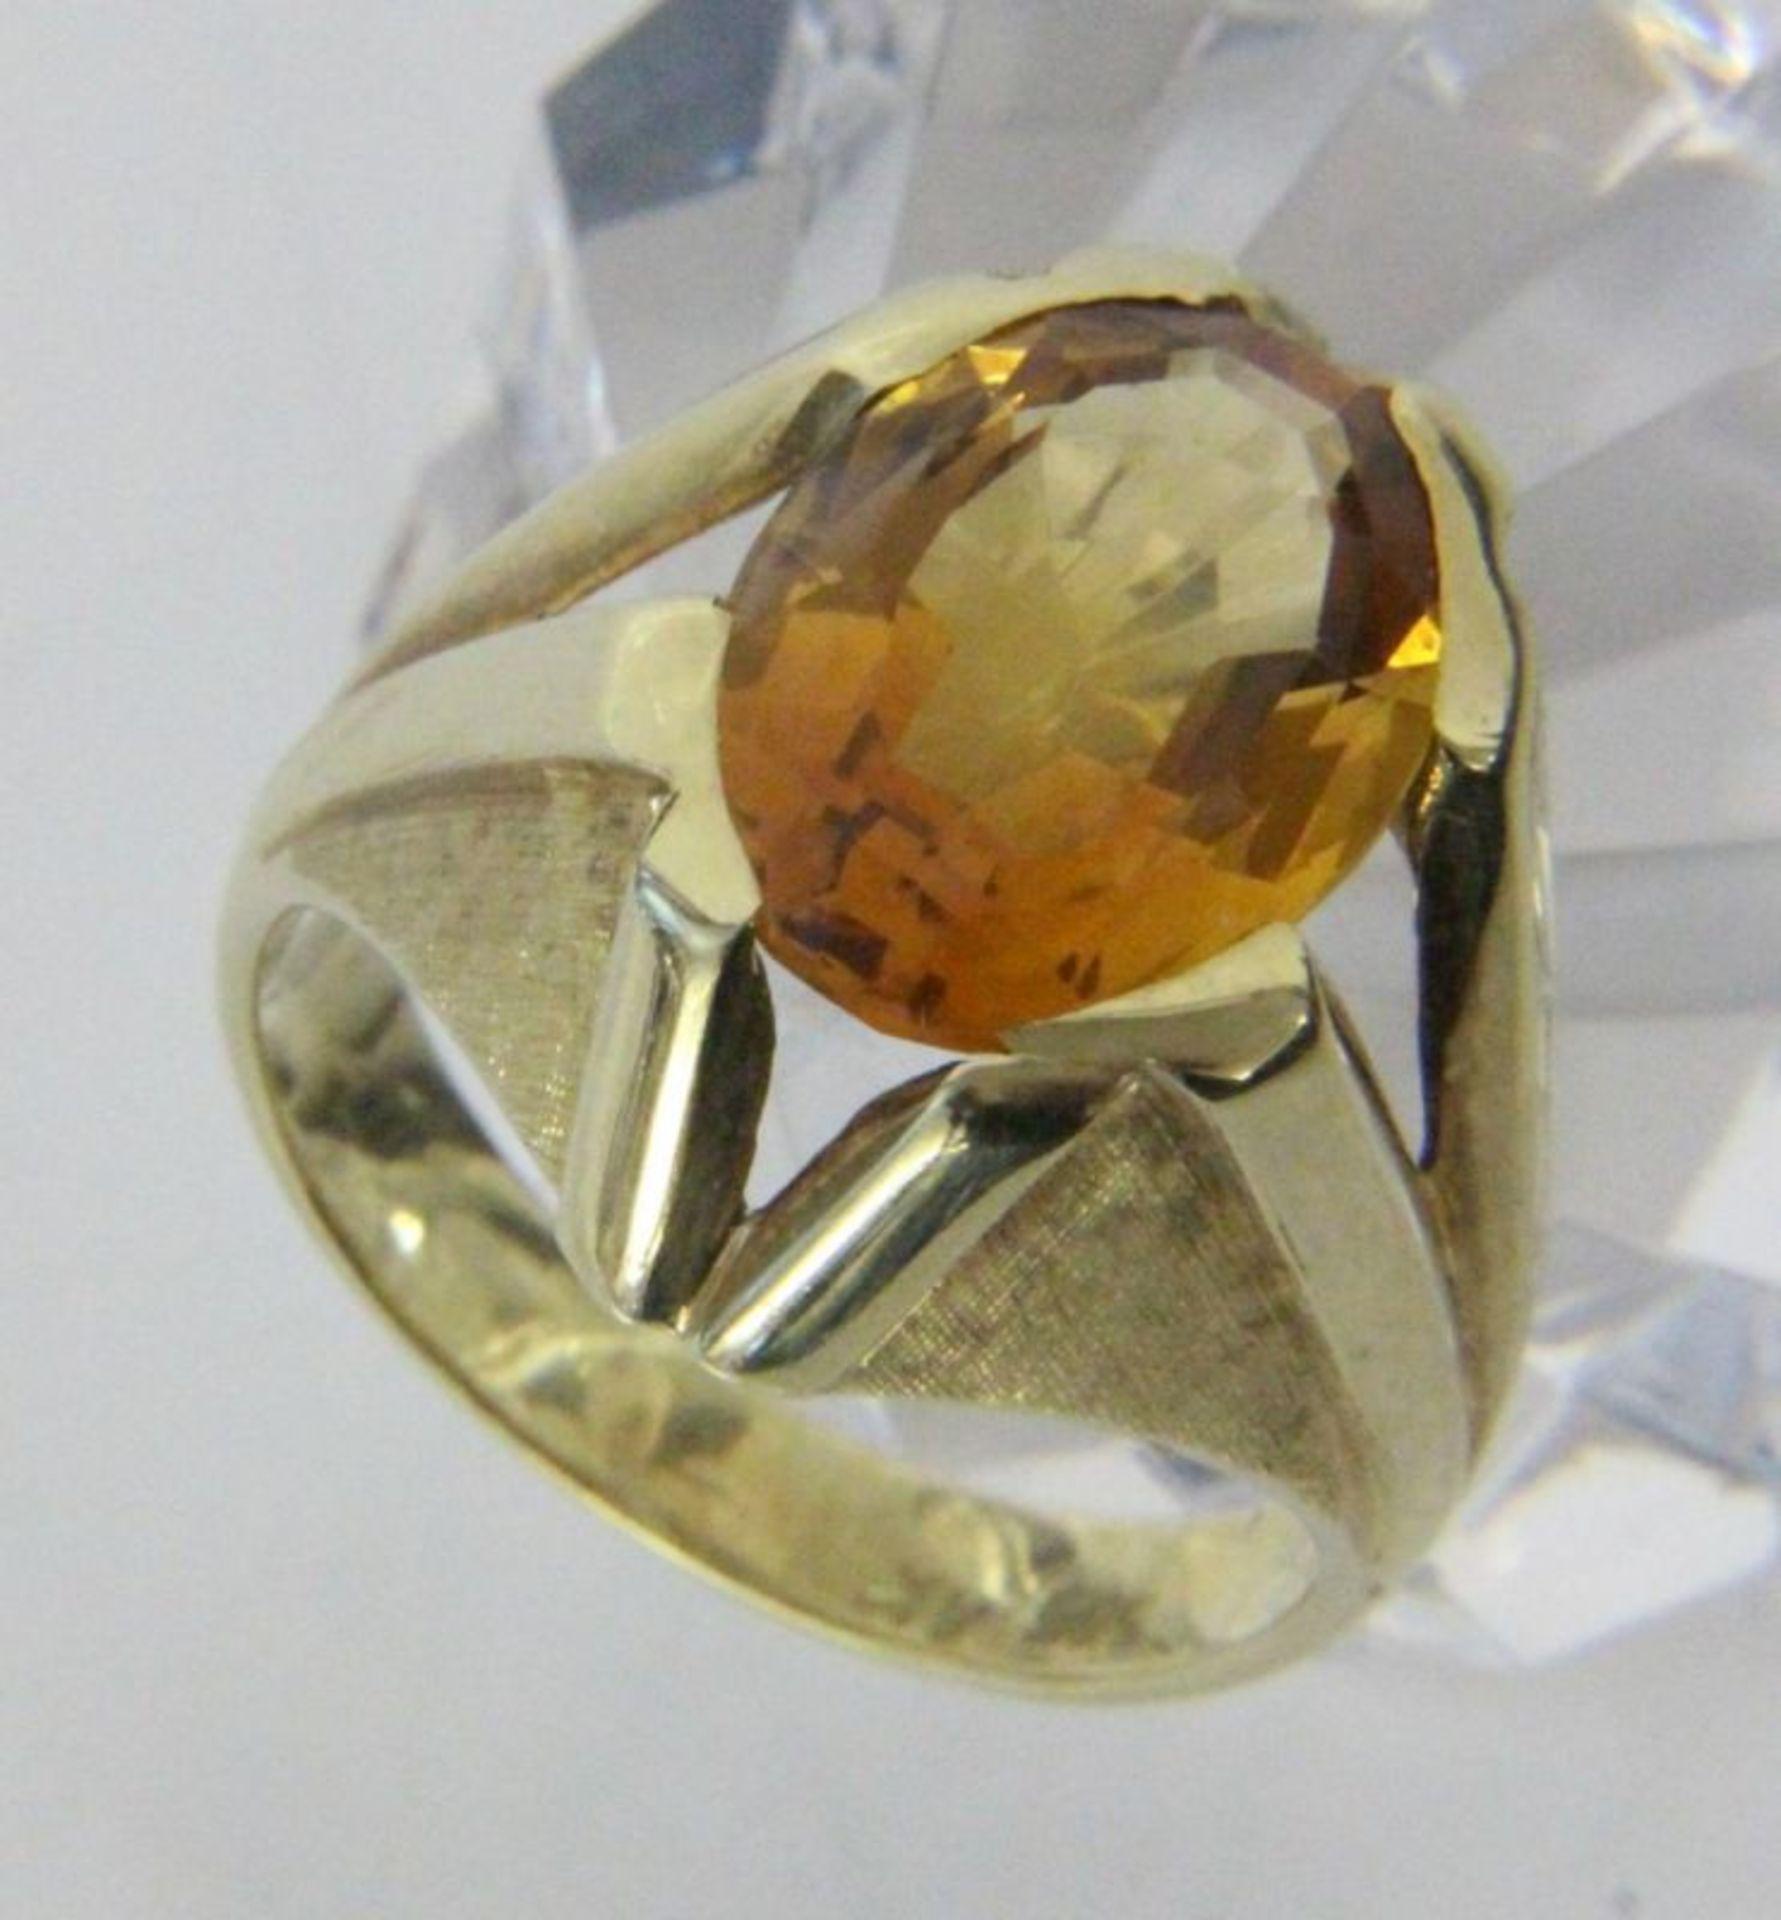 DAMENRING585/000 Gelbgold mit Citrin. Ringgr. 57, Brutto ca. 8,7gA LADIES RING 585/000 yellow gold